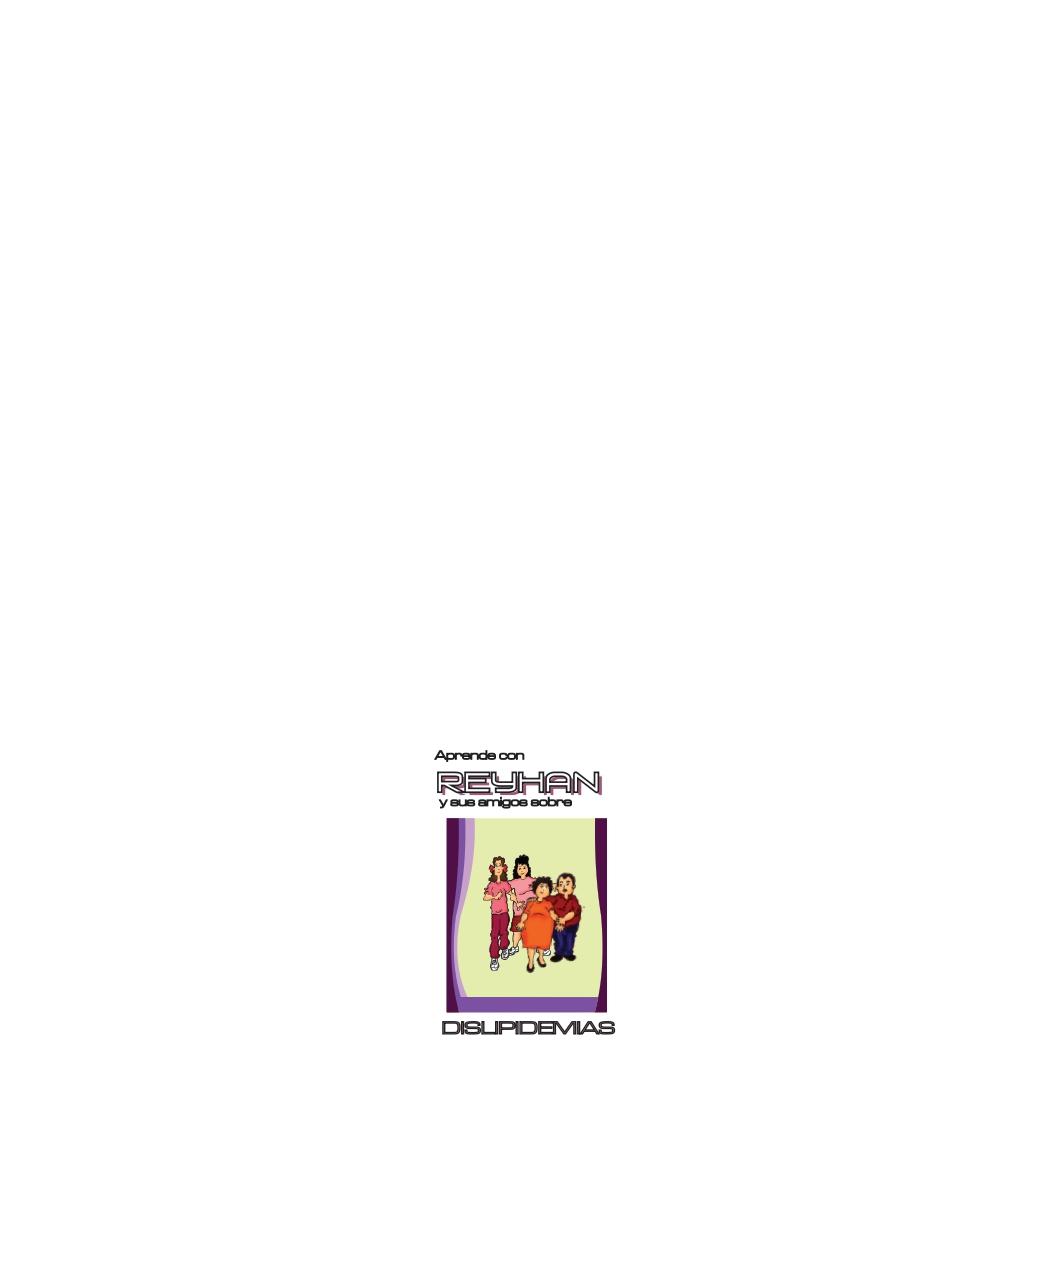 Dislipidemias digital_page-0024